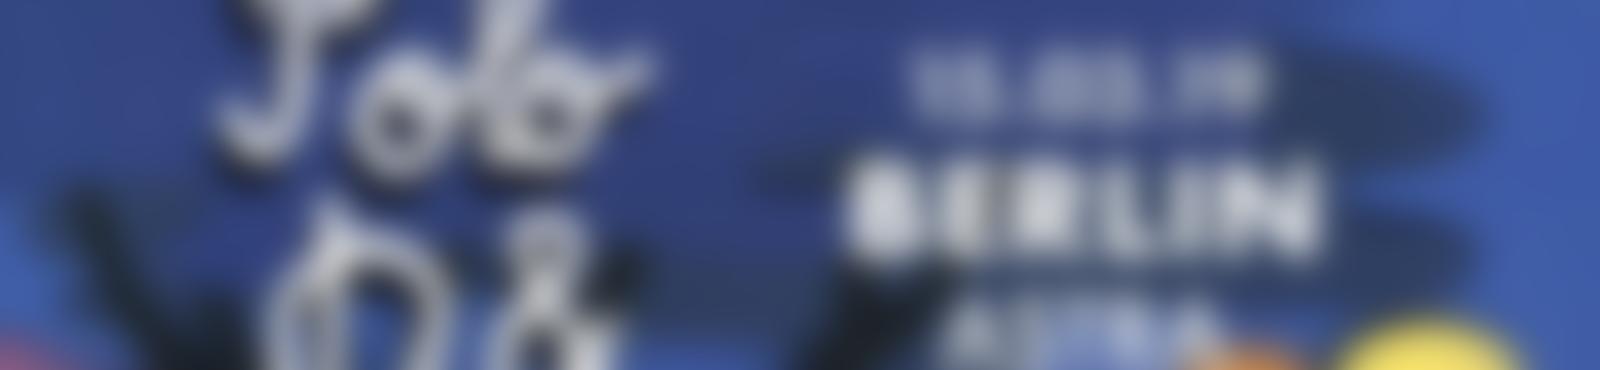 Blurred e81781a3 27fe 43a7 8407 3abc9e846d22